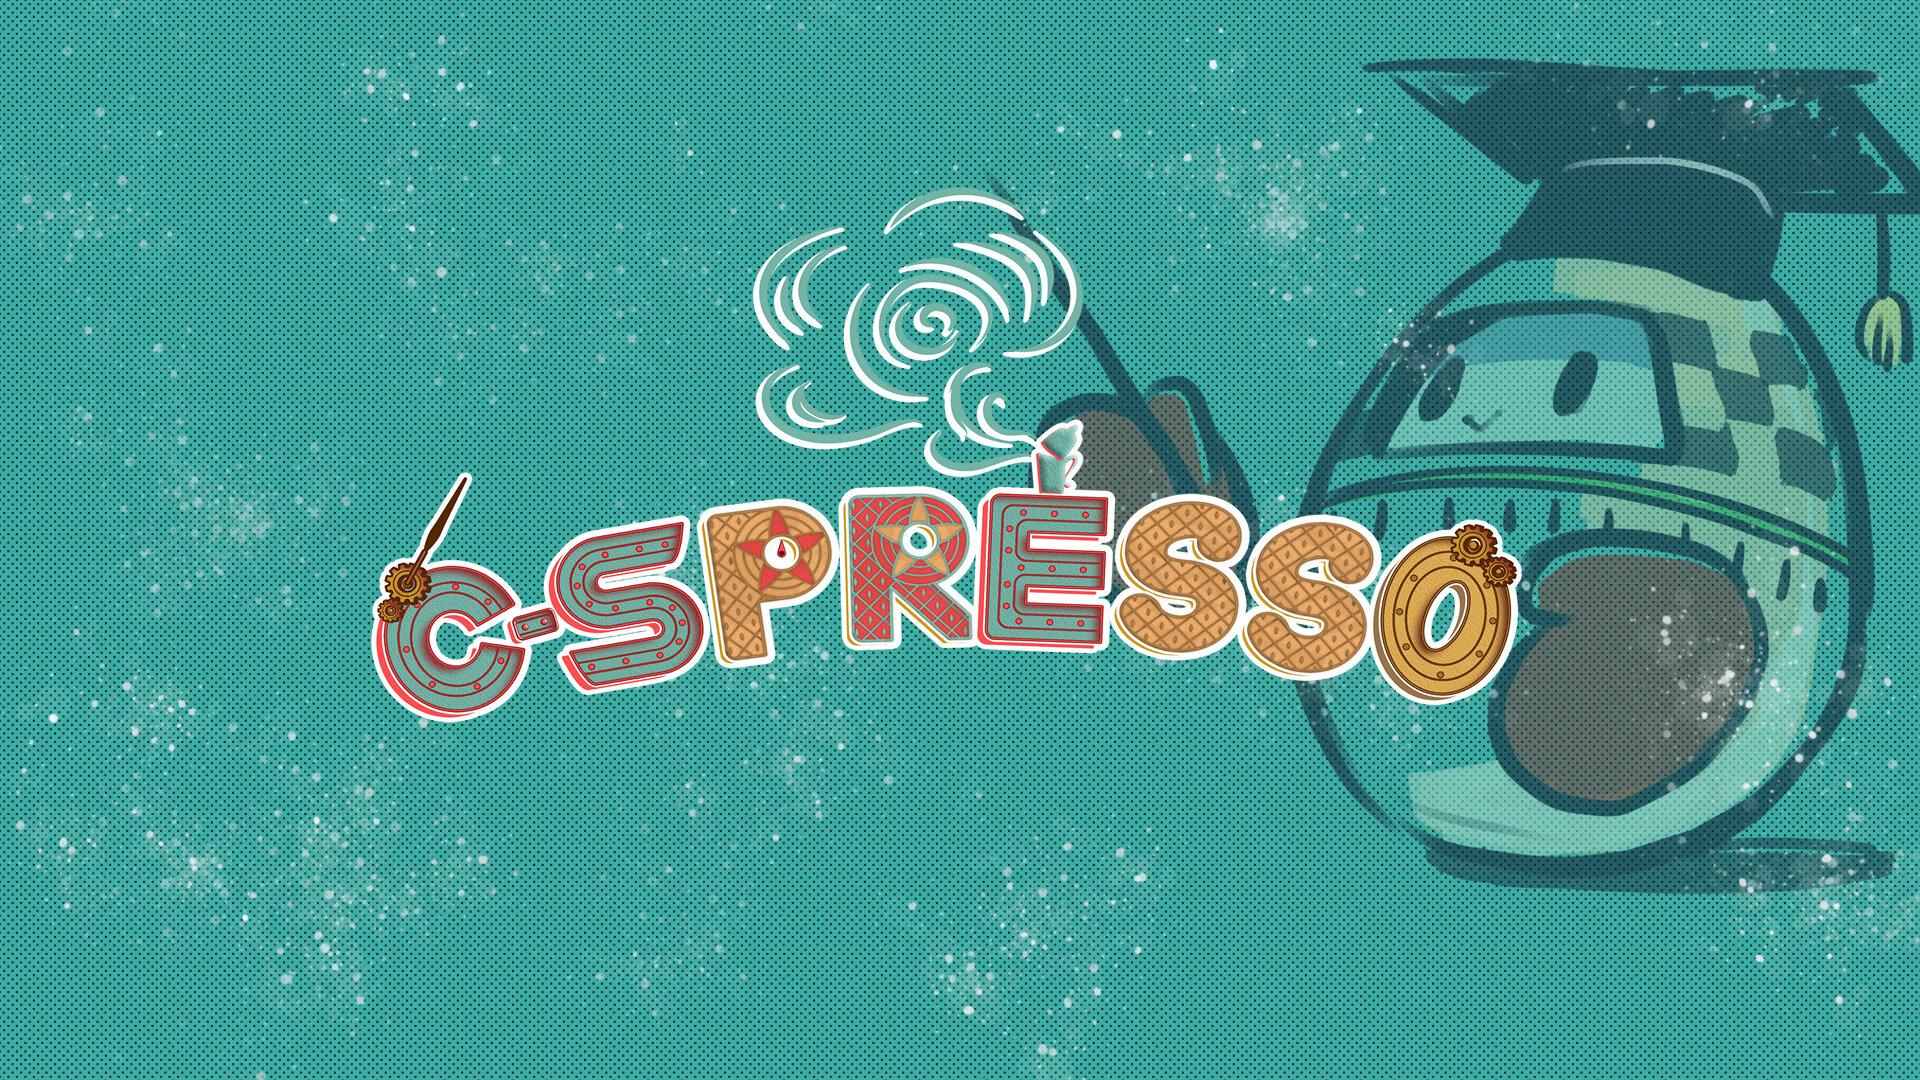 CSpresso_Poster.jpg